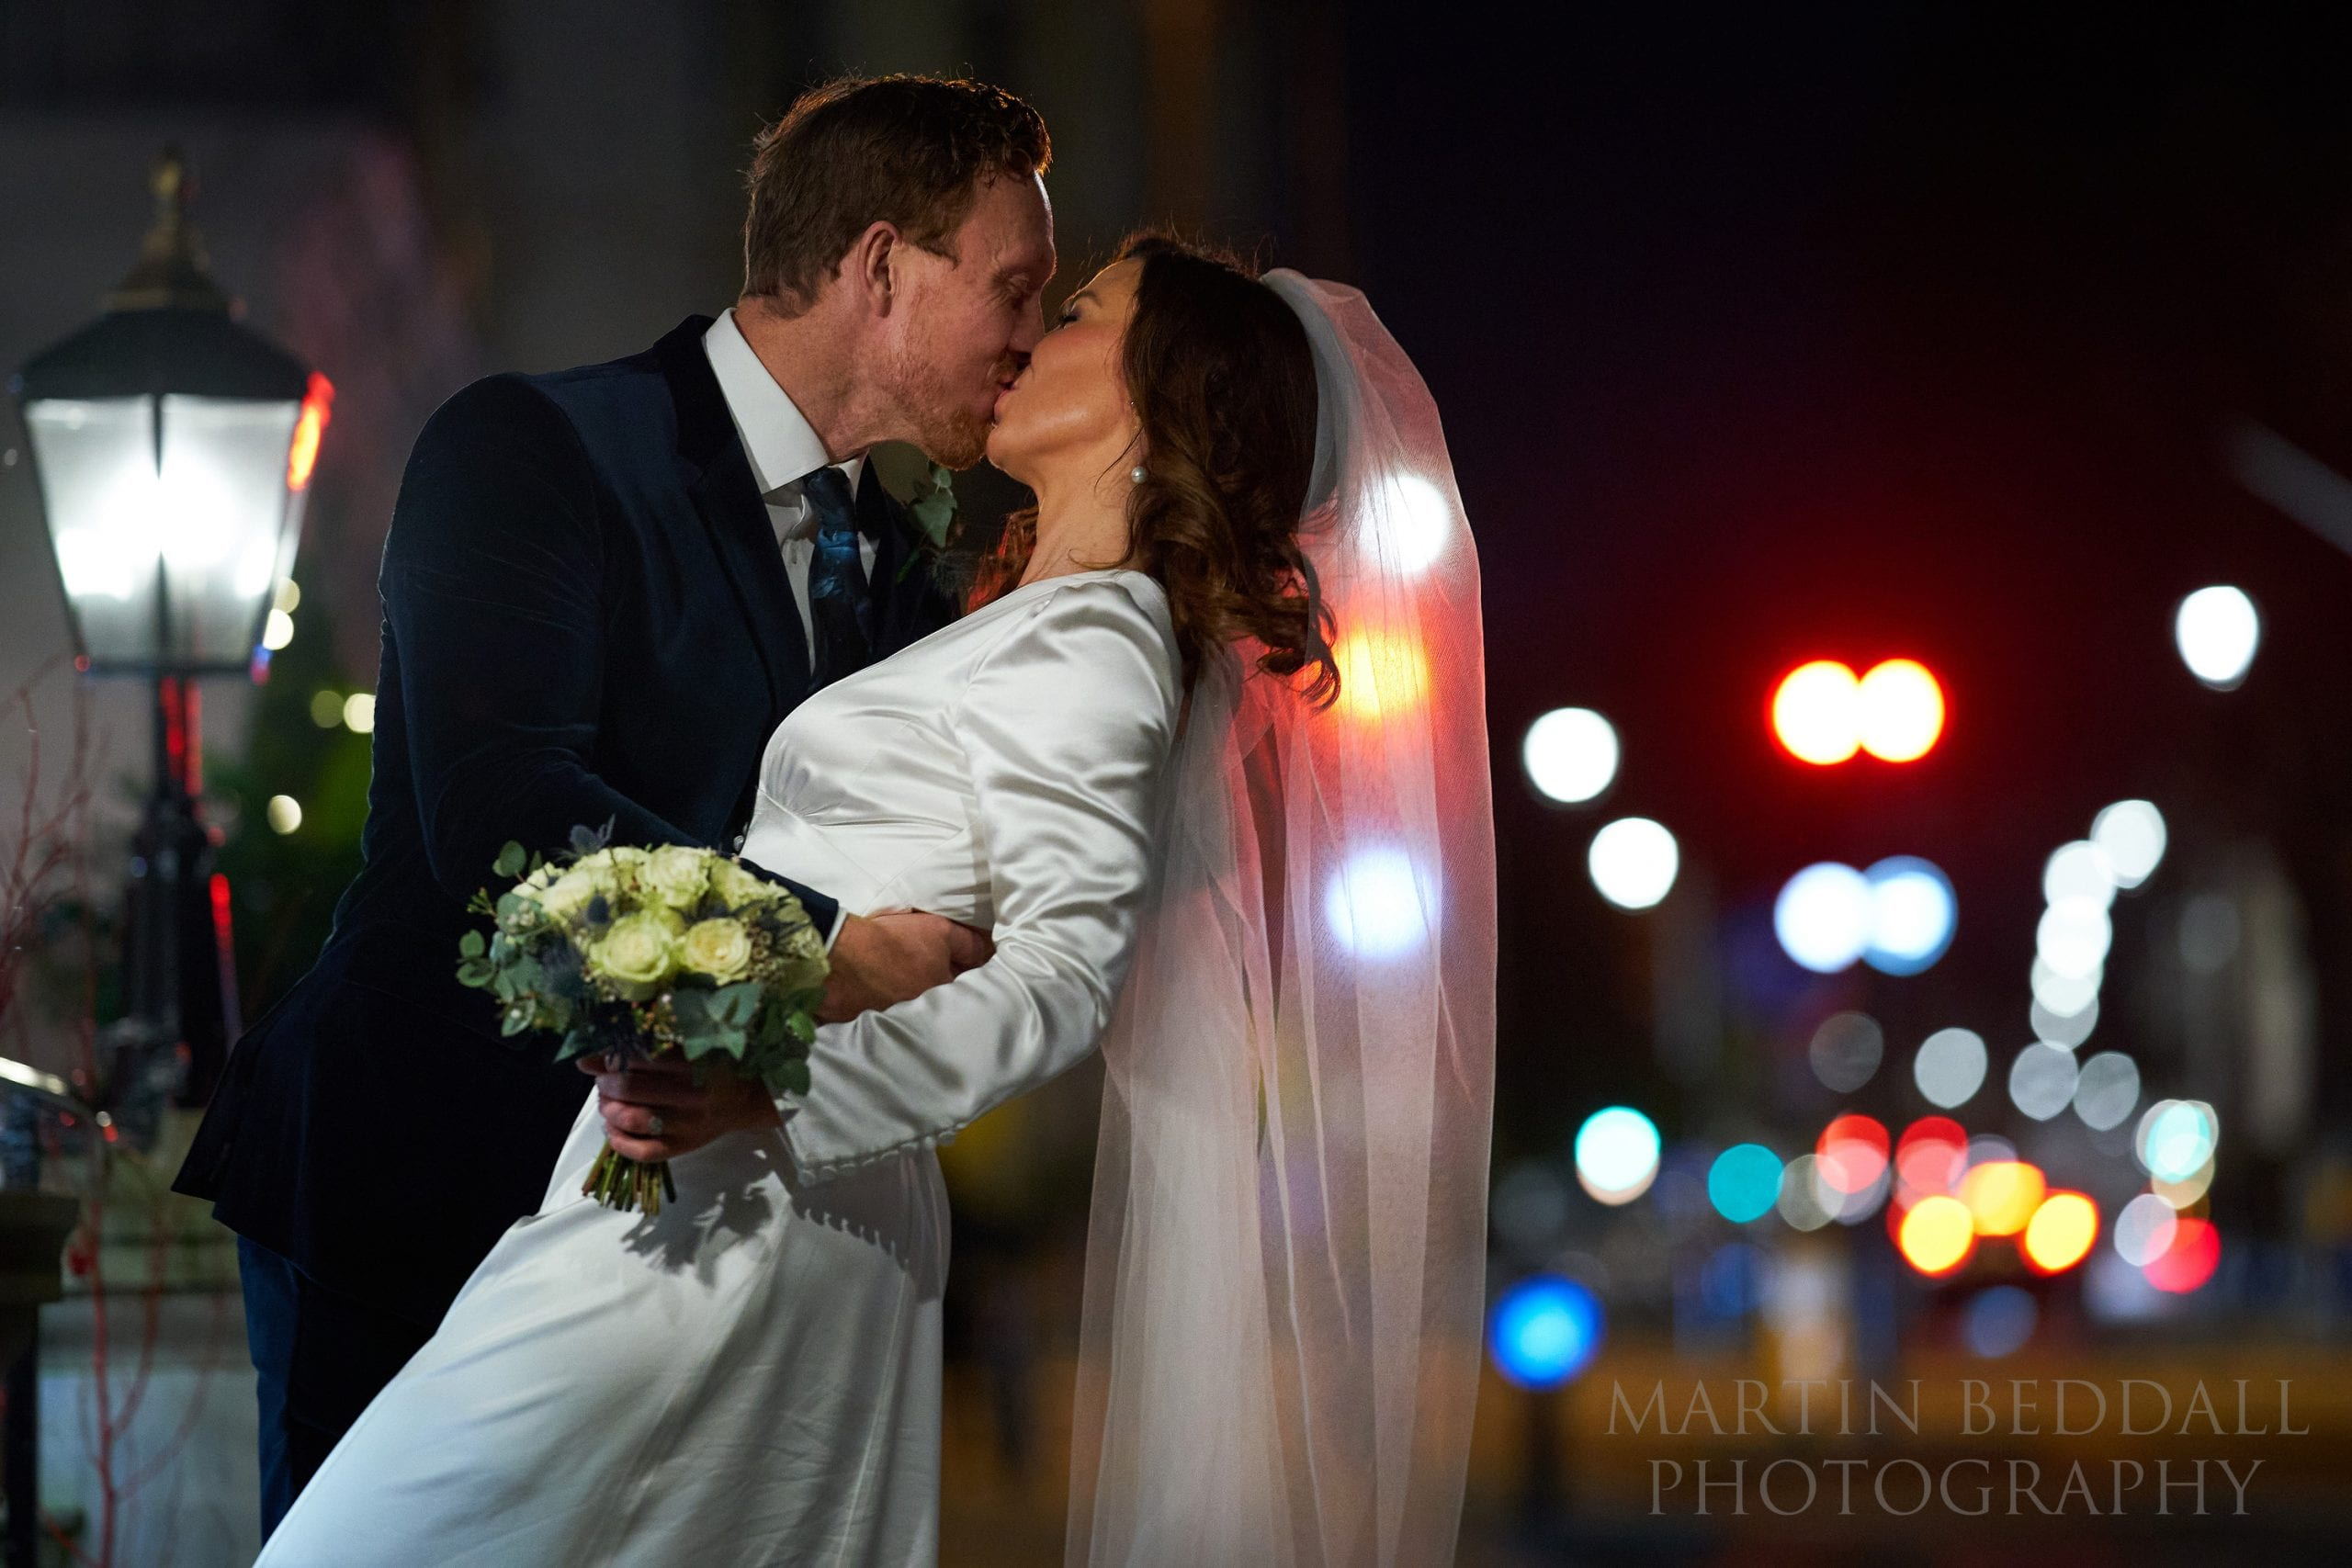 Winter wedding at The Goring Hotel